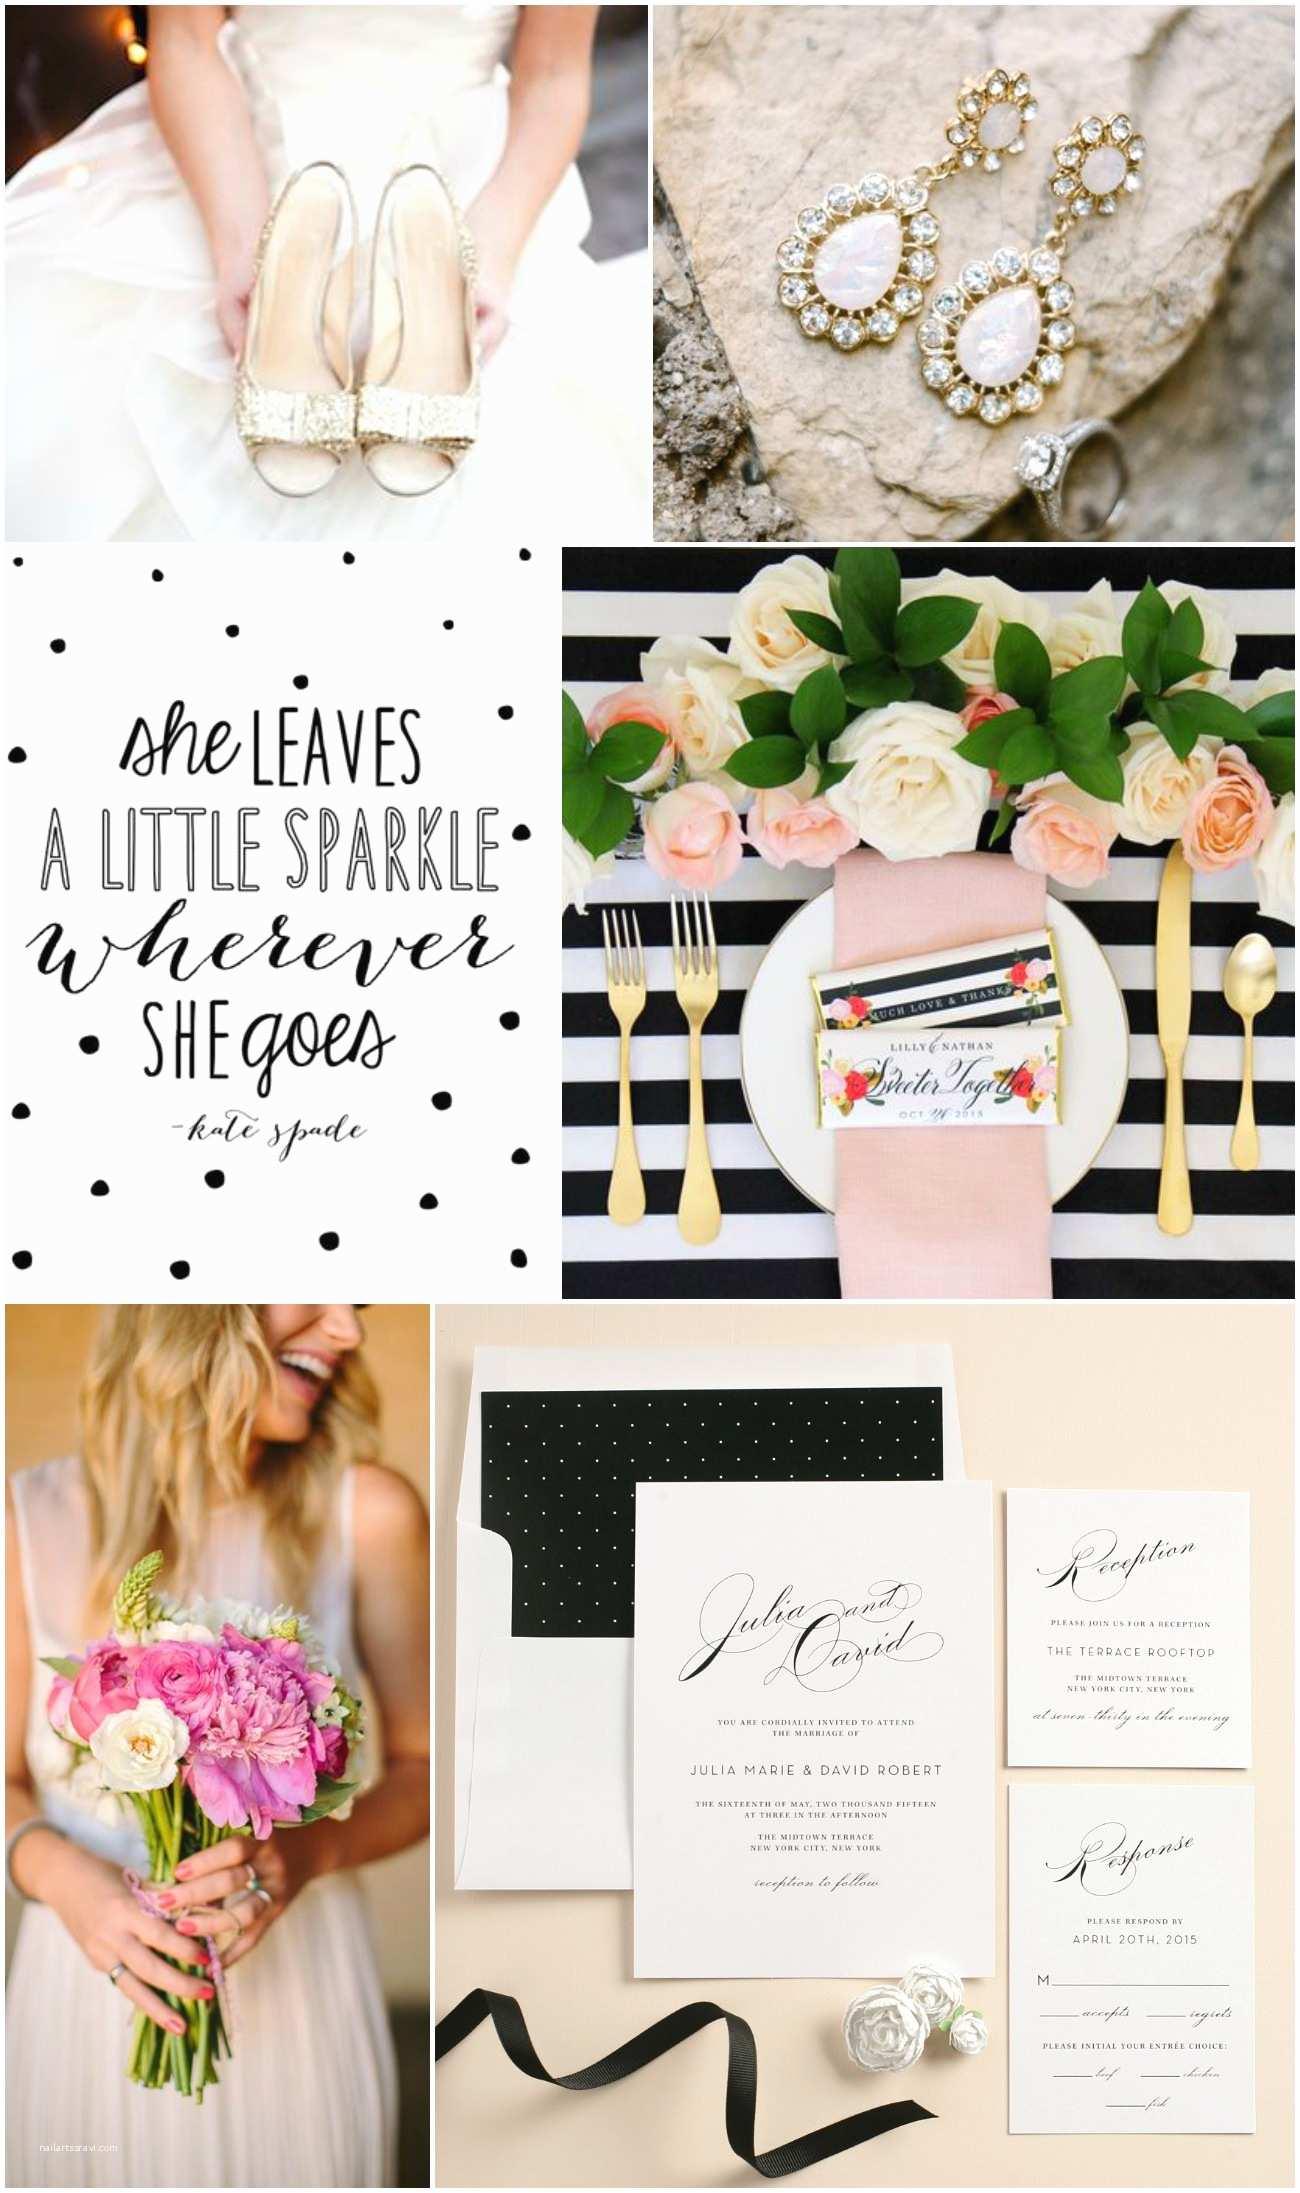 Kate Spade Wedding Invitations Top Al